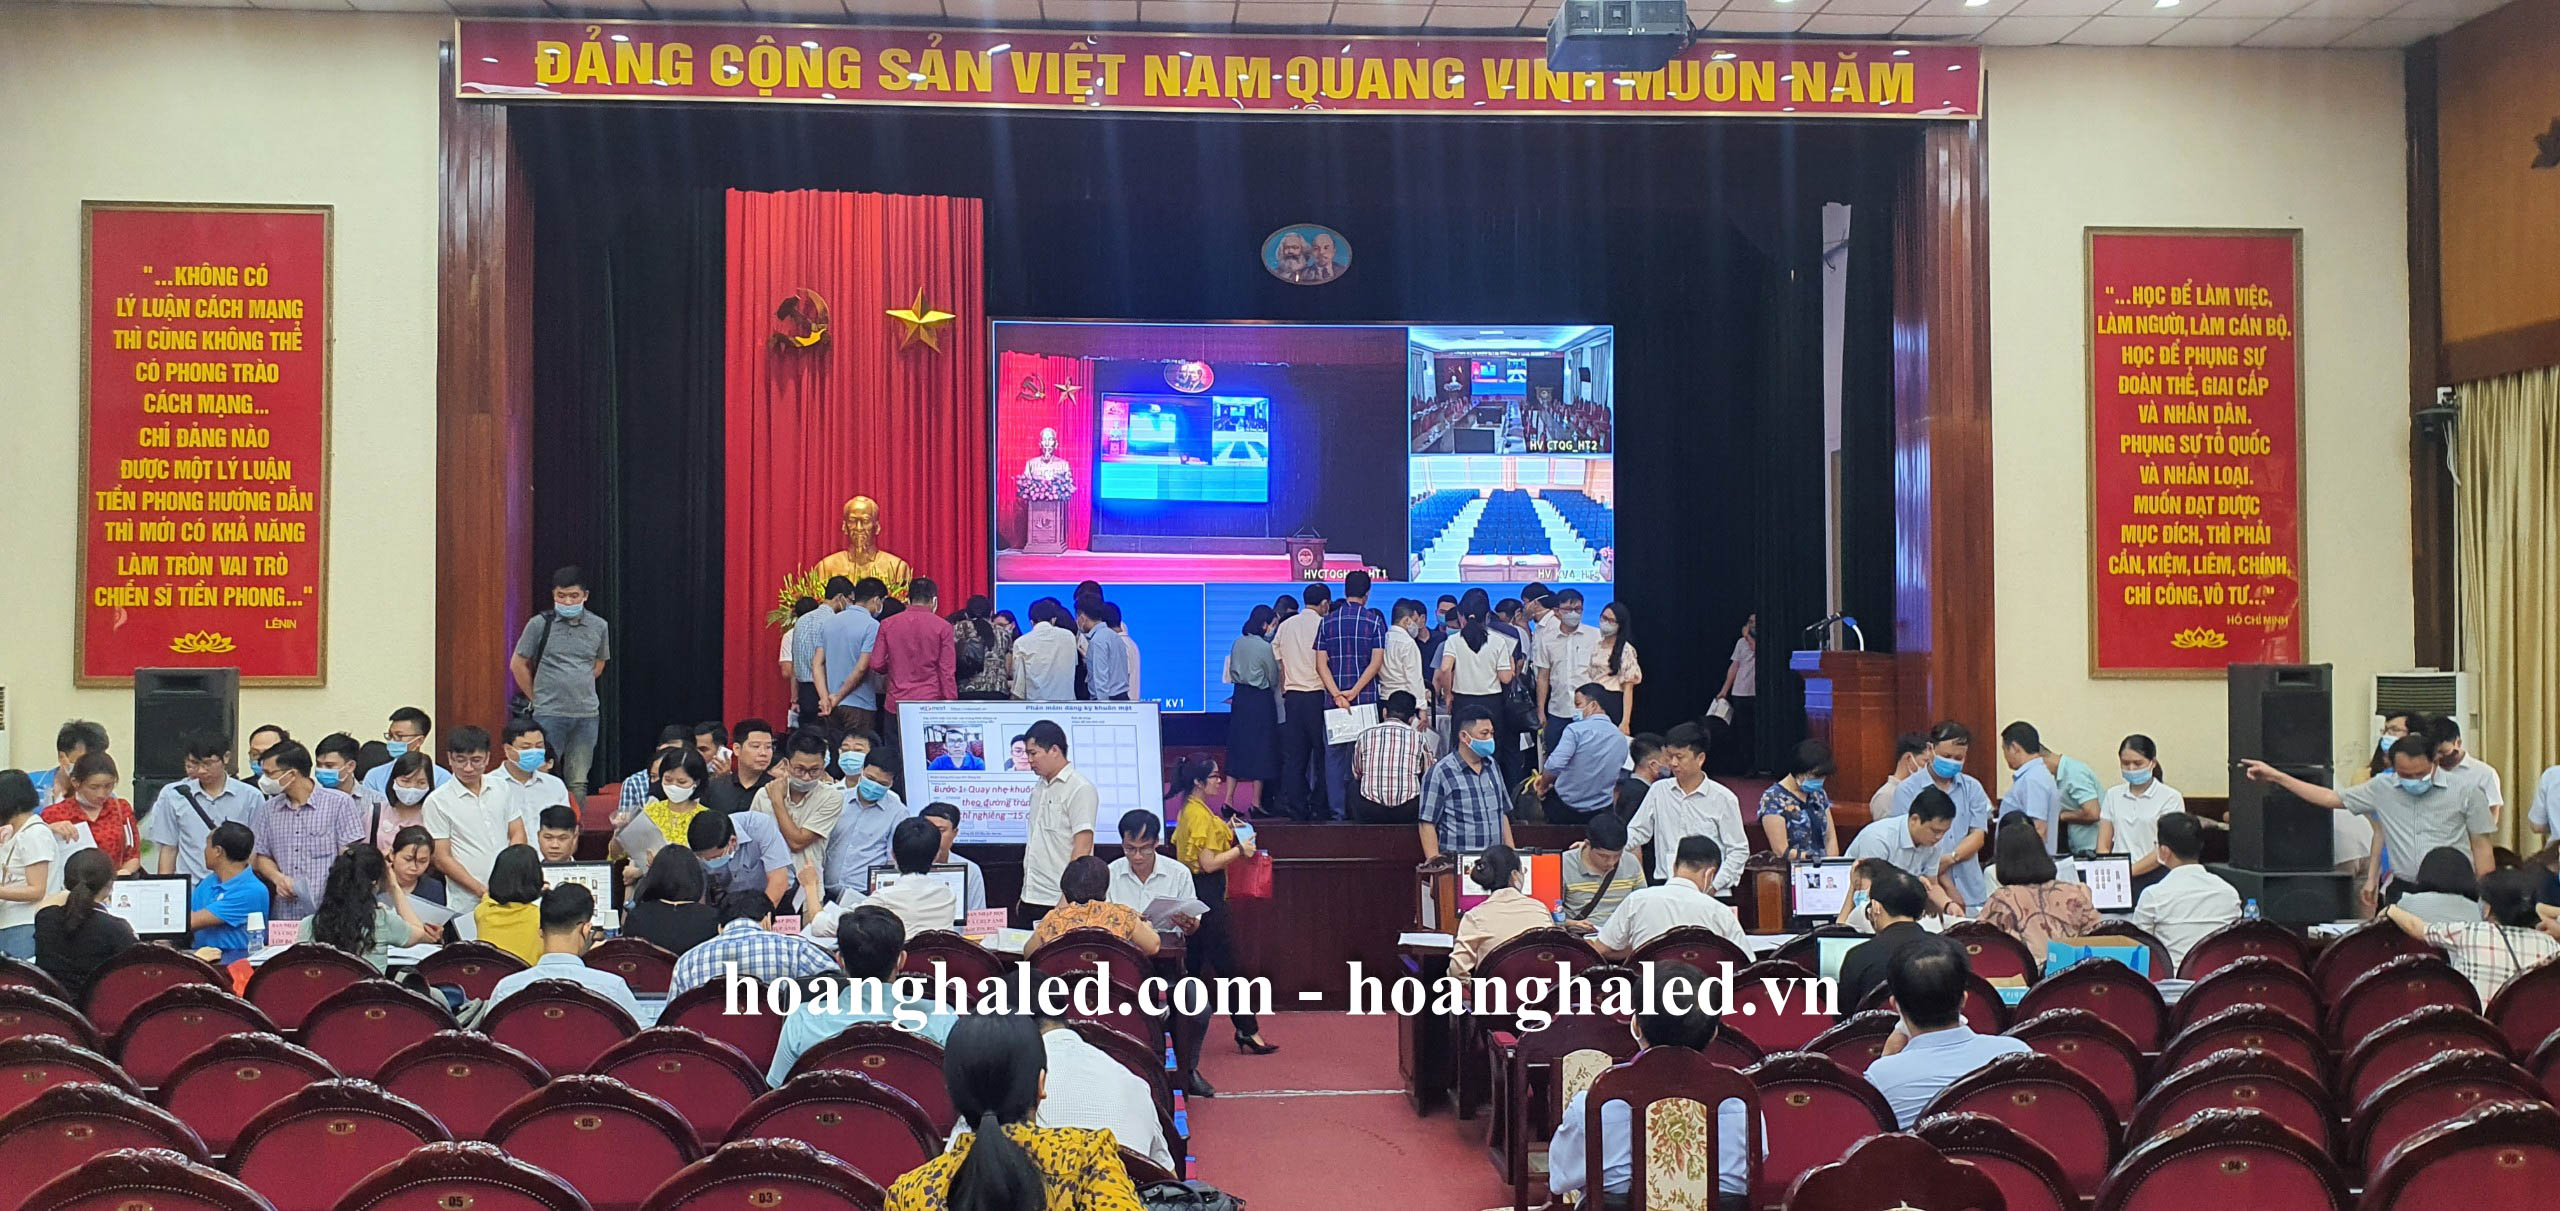 man_hinh_led_p3_trong_nha_tai_hoc_vien_chinh_tri_khu_vuc_i_1